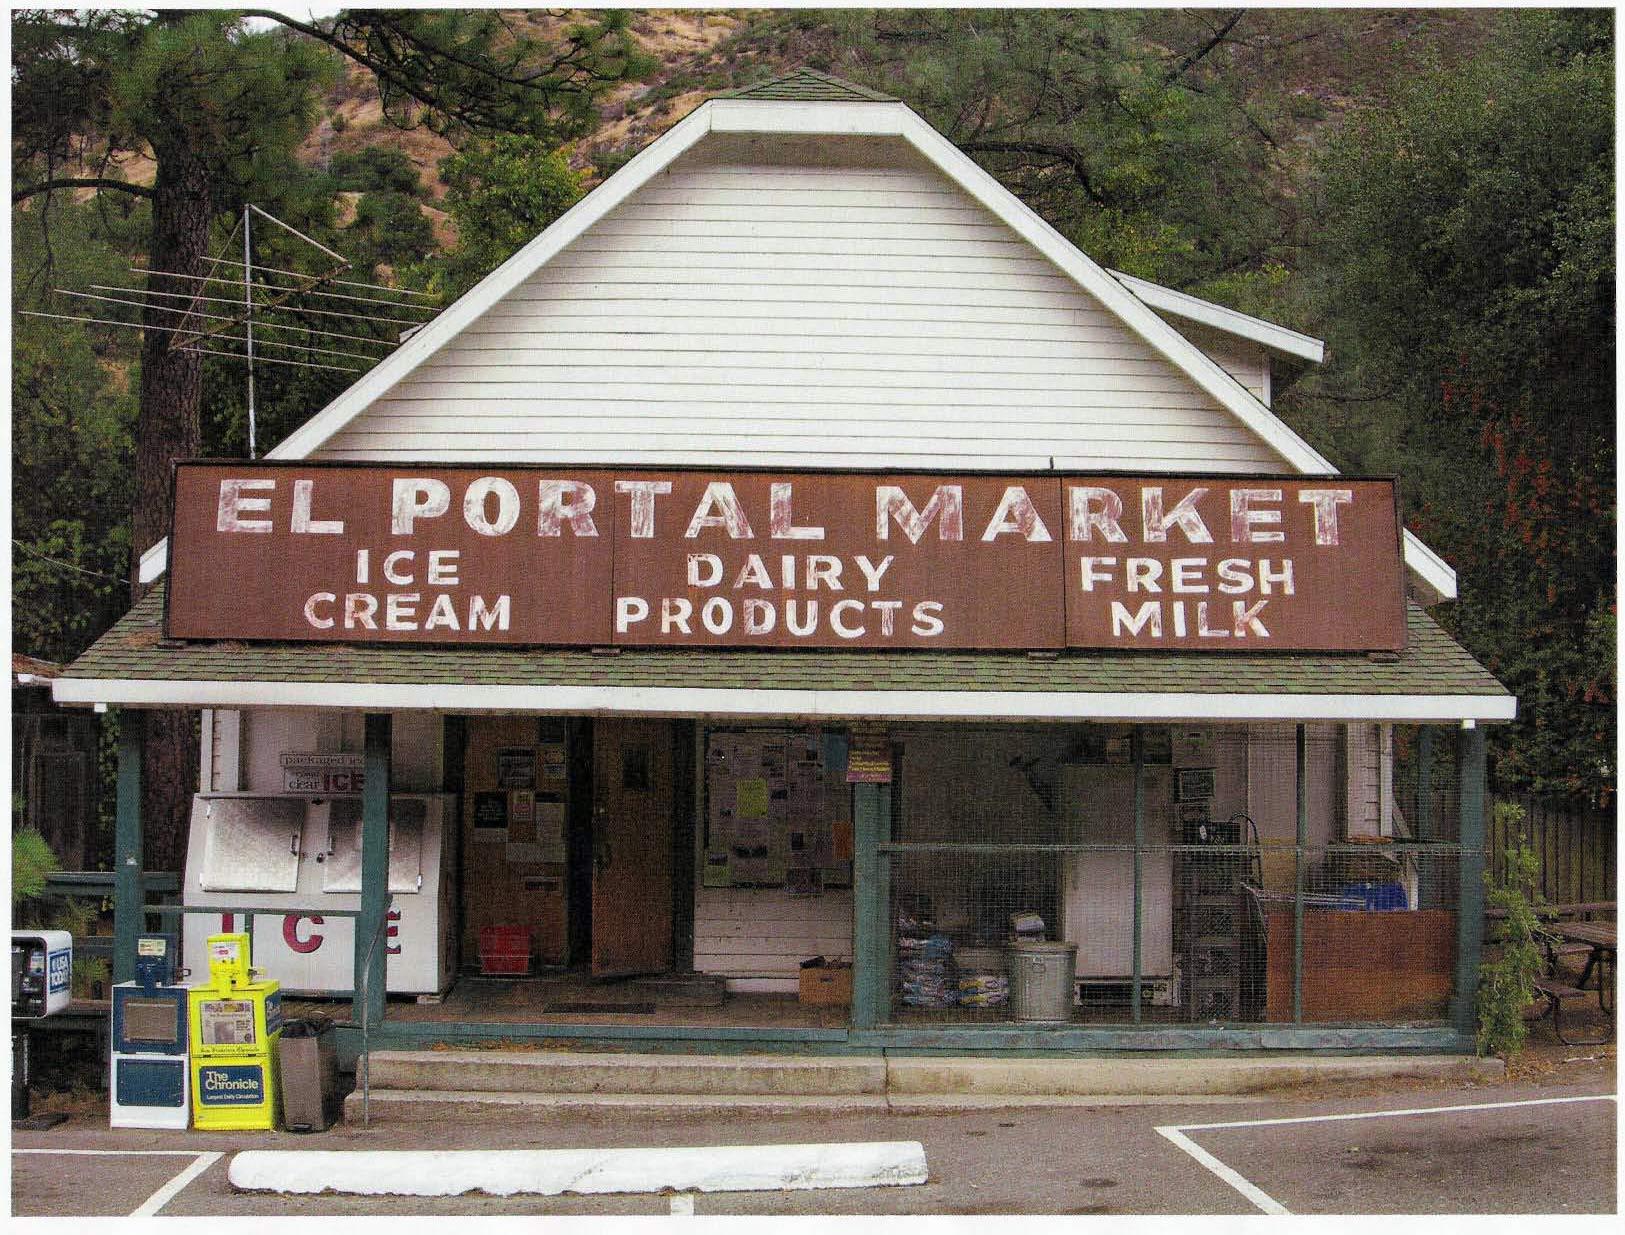 Cheap hotels in El Portal, California